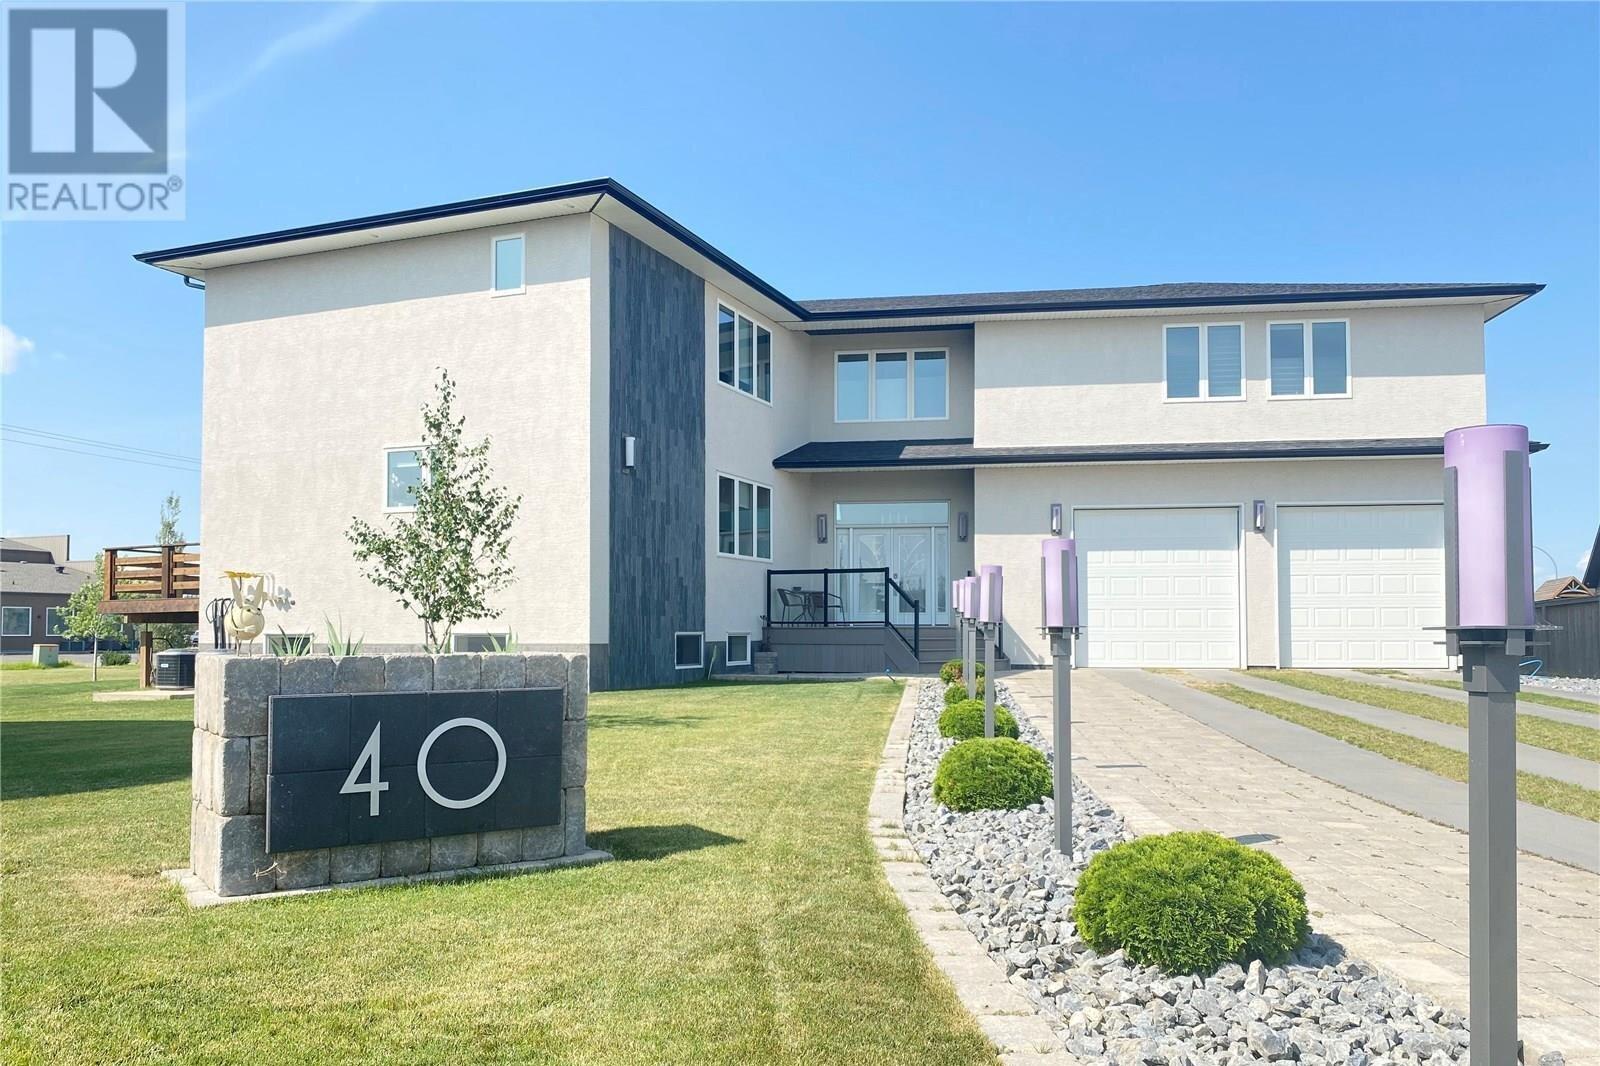 House for sale at 40 Shields Pl Weyburn Saskatchewan - MLS: SK821615